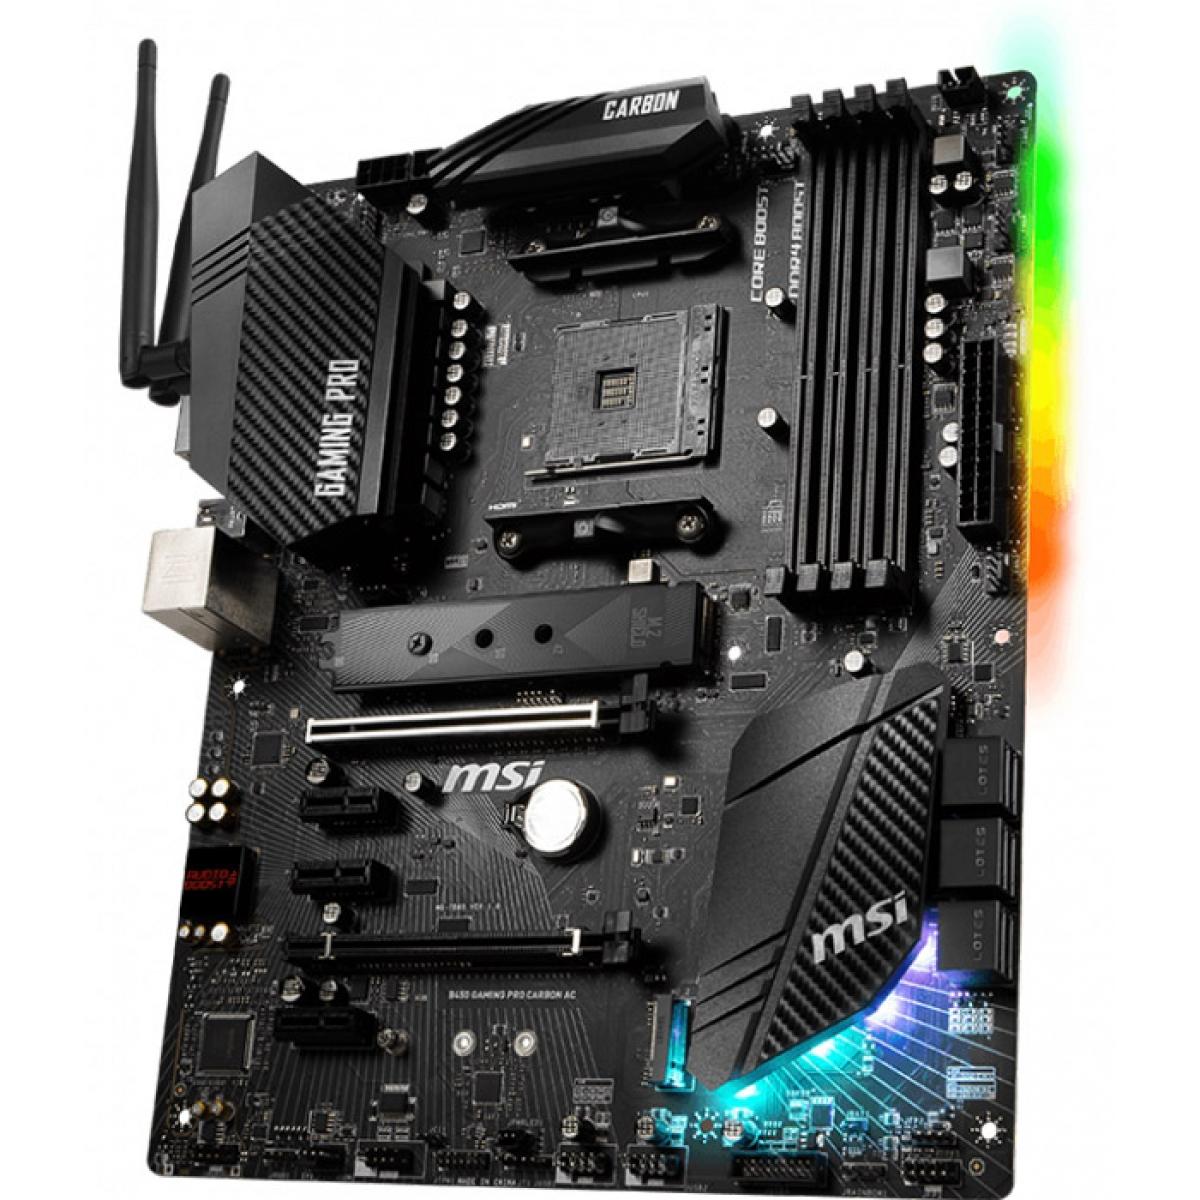 Placa Mãe MSI B450 Gaming Pro Carbon Ac, Chipset B450, AMD AM4, ATX, DDR4